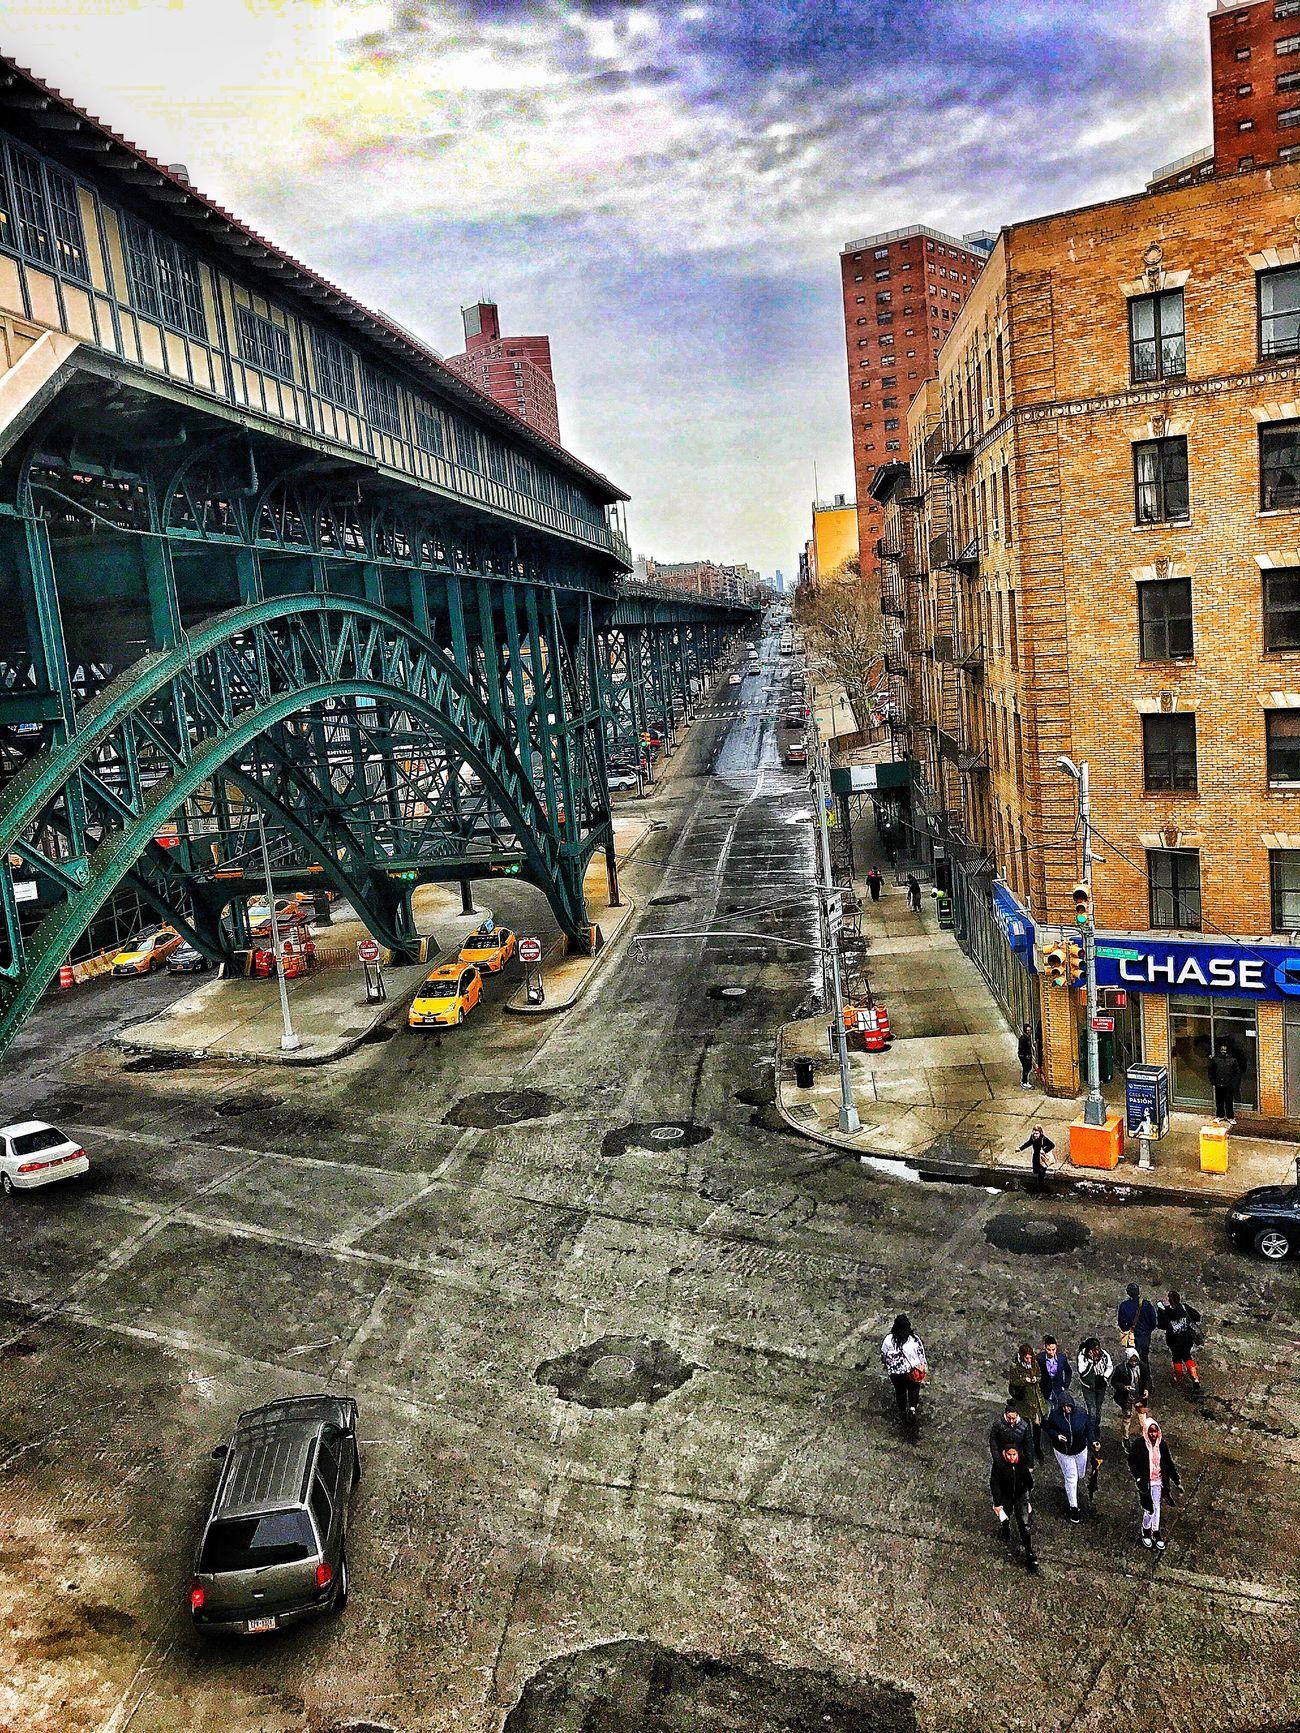 Streetphotography Subway Sabado / Saturday